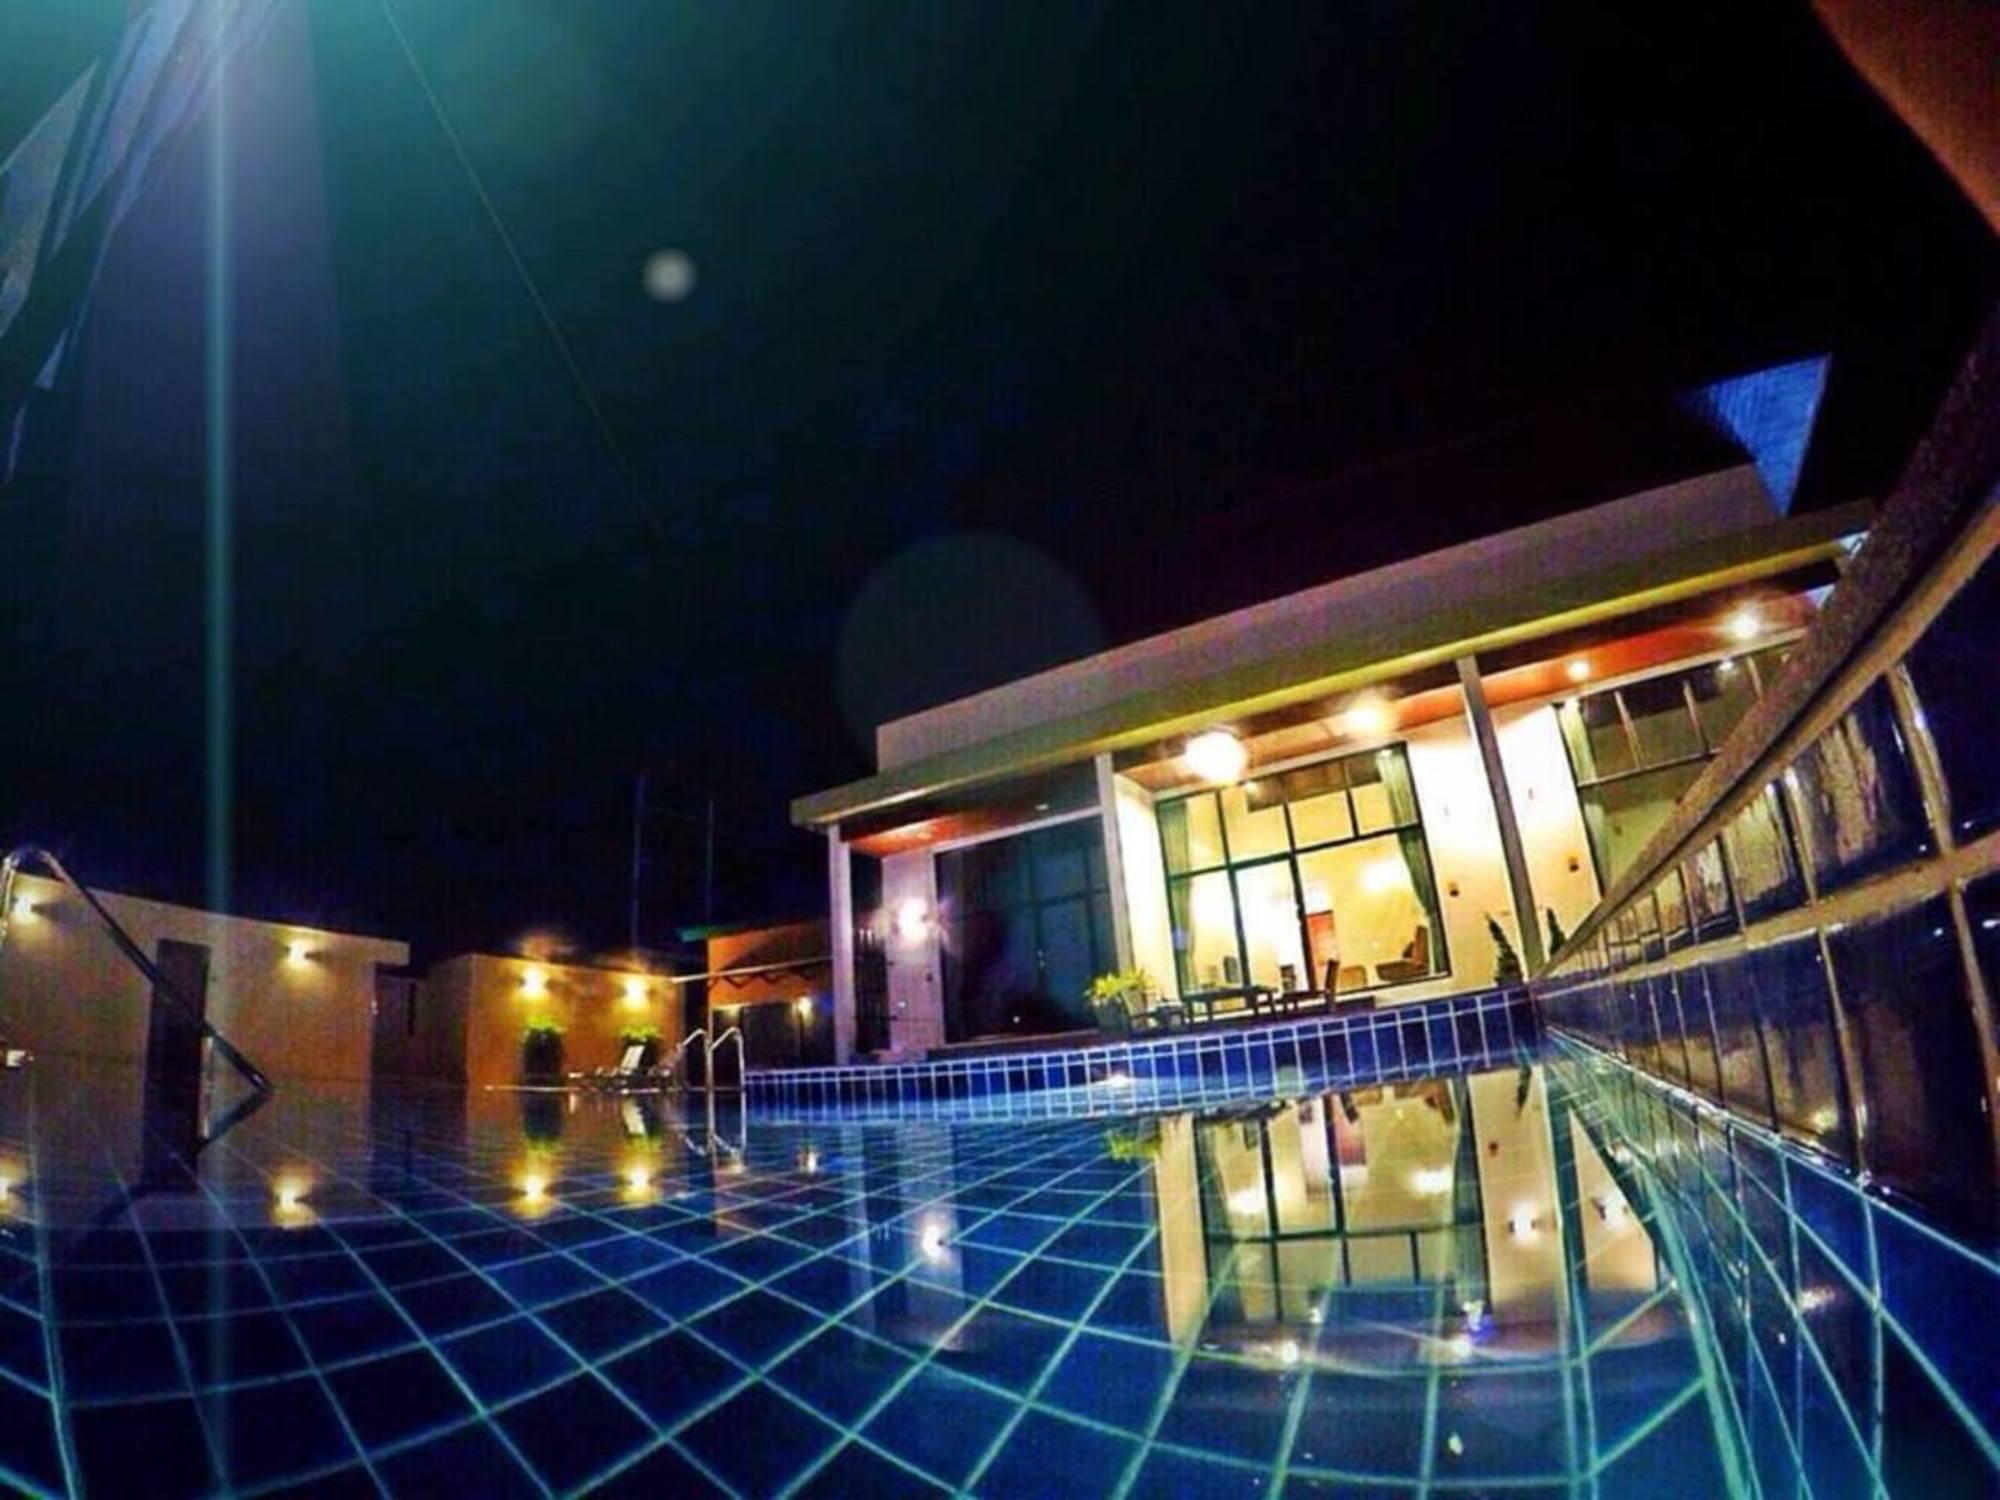 Goodtimes Pool Villa 2(Walk To Beach) วิลลา 2 ห้องนอน 1 ห้องน้ำส่วนตัว ขนาด 200 ตร.ม. – ทองผาภูมิ